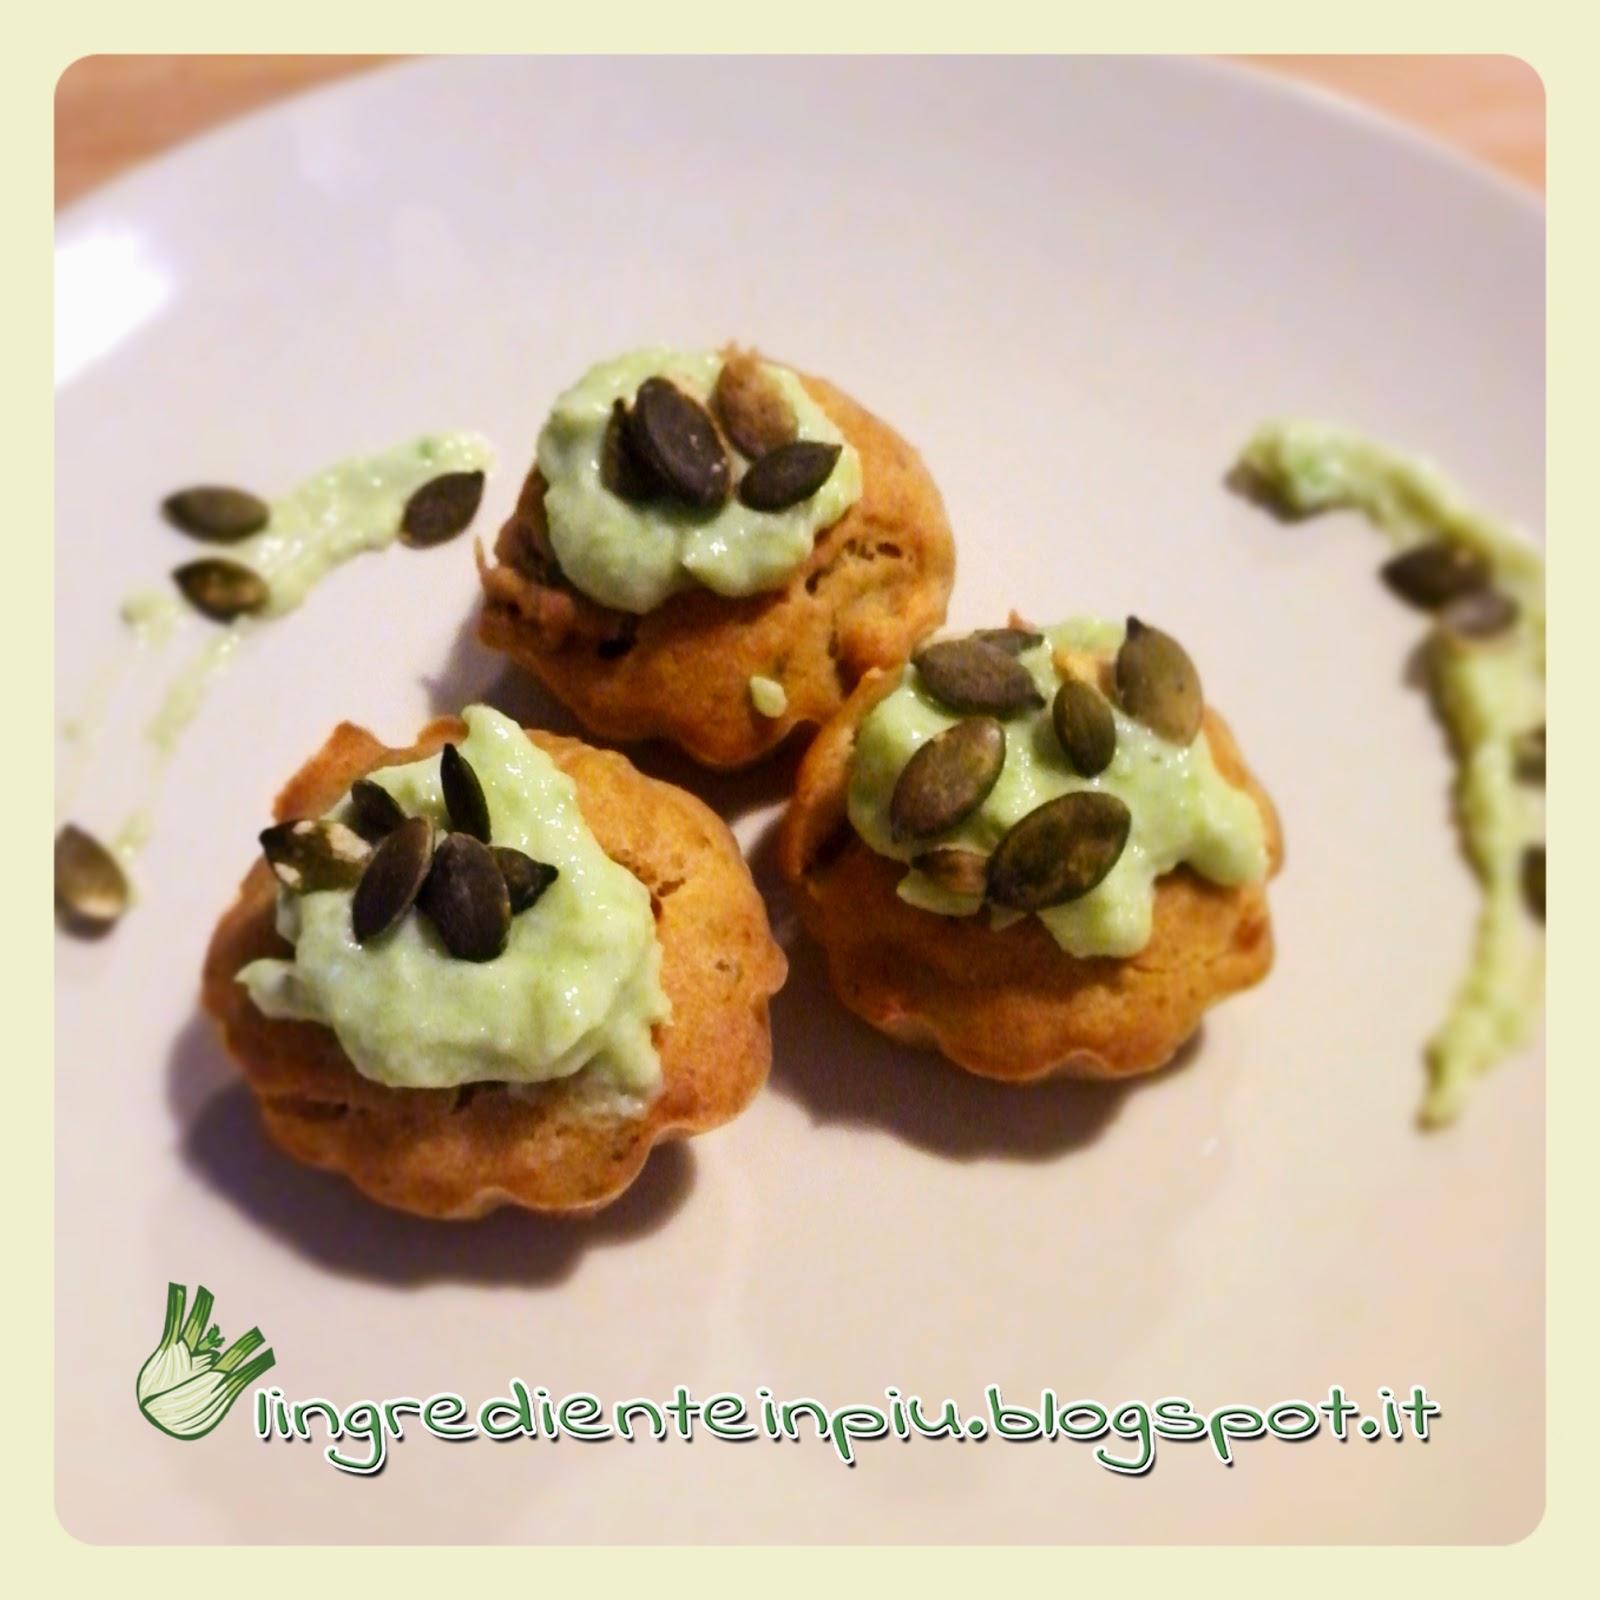 Muffin accattivanti